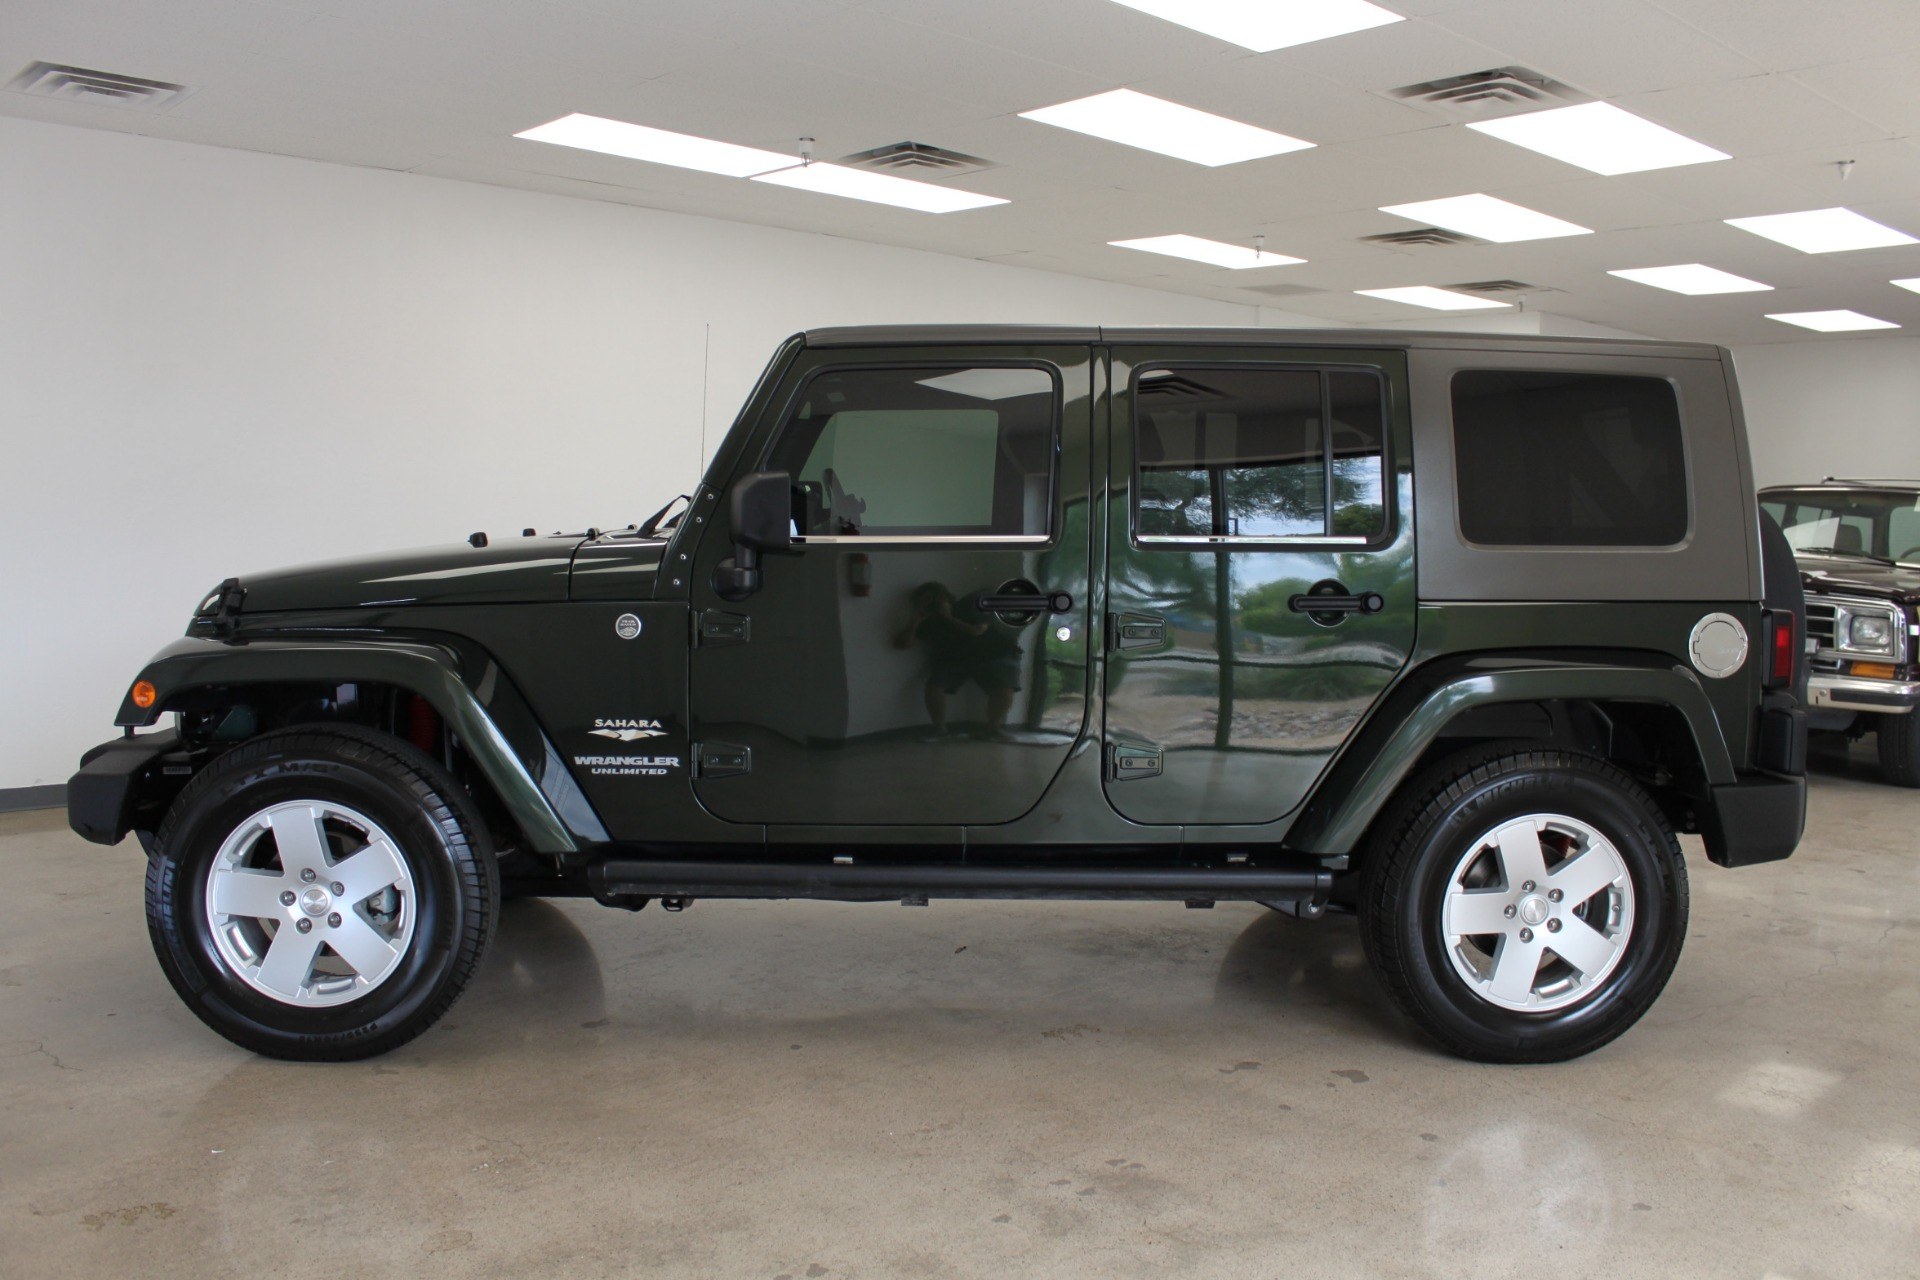 Used-2010-Jeep-Wrangler-Unlimited-Sahara-4X4-Grand-Wagoneer